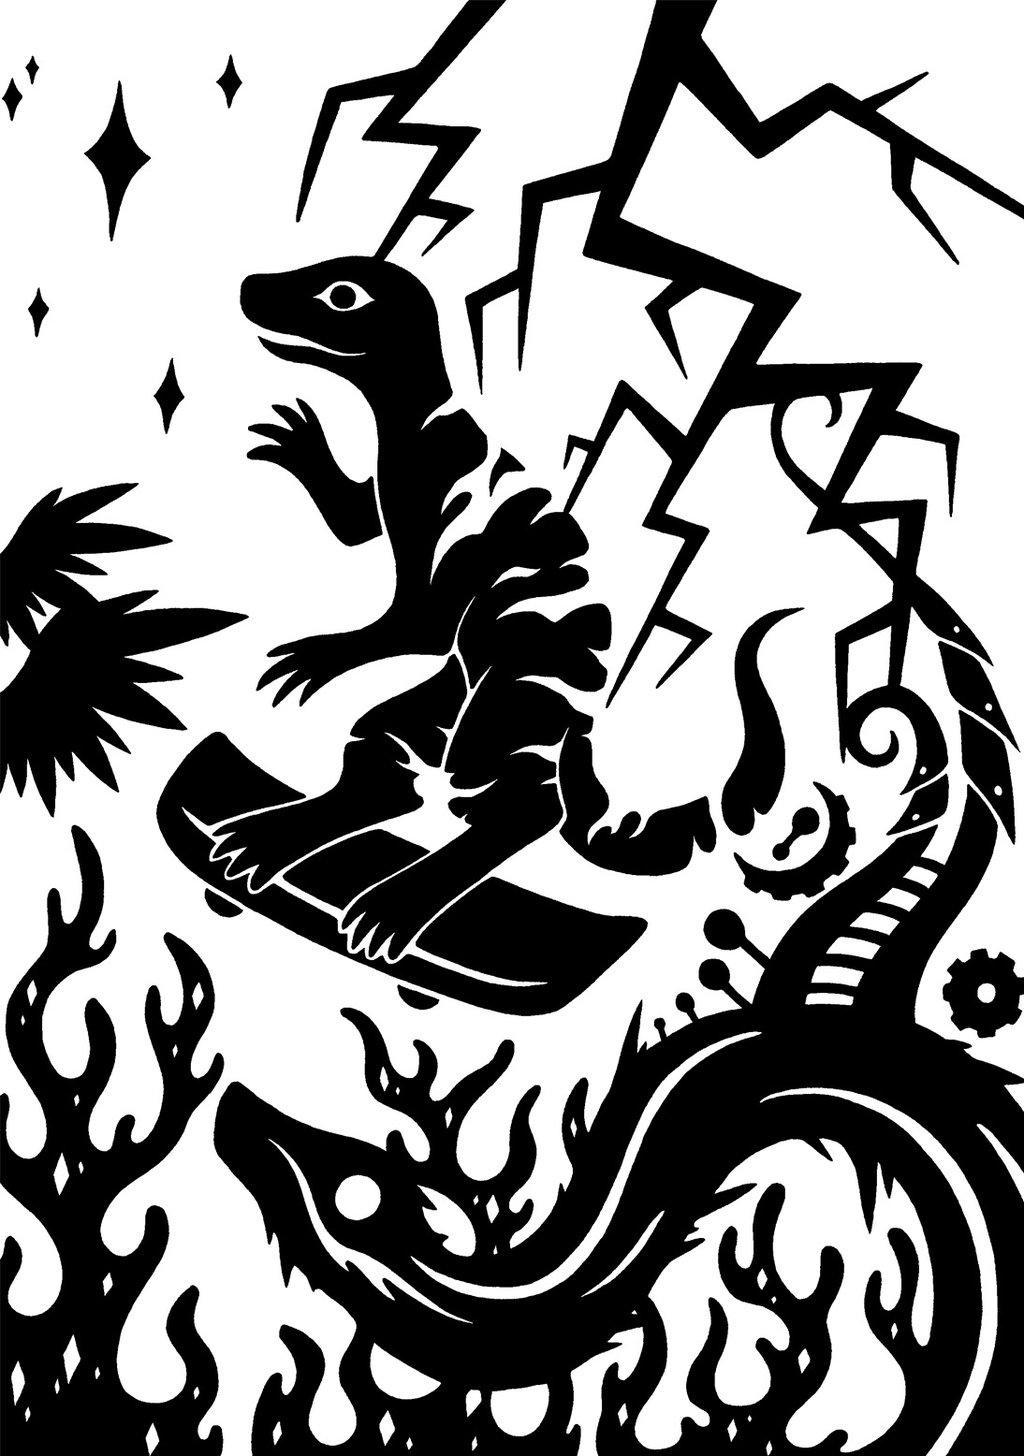 SCP-2014 - 蜥蜴里的邪神Zsar Magoth